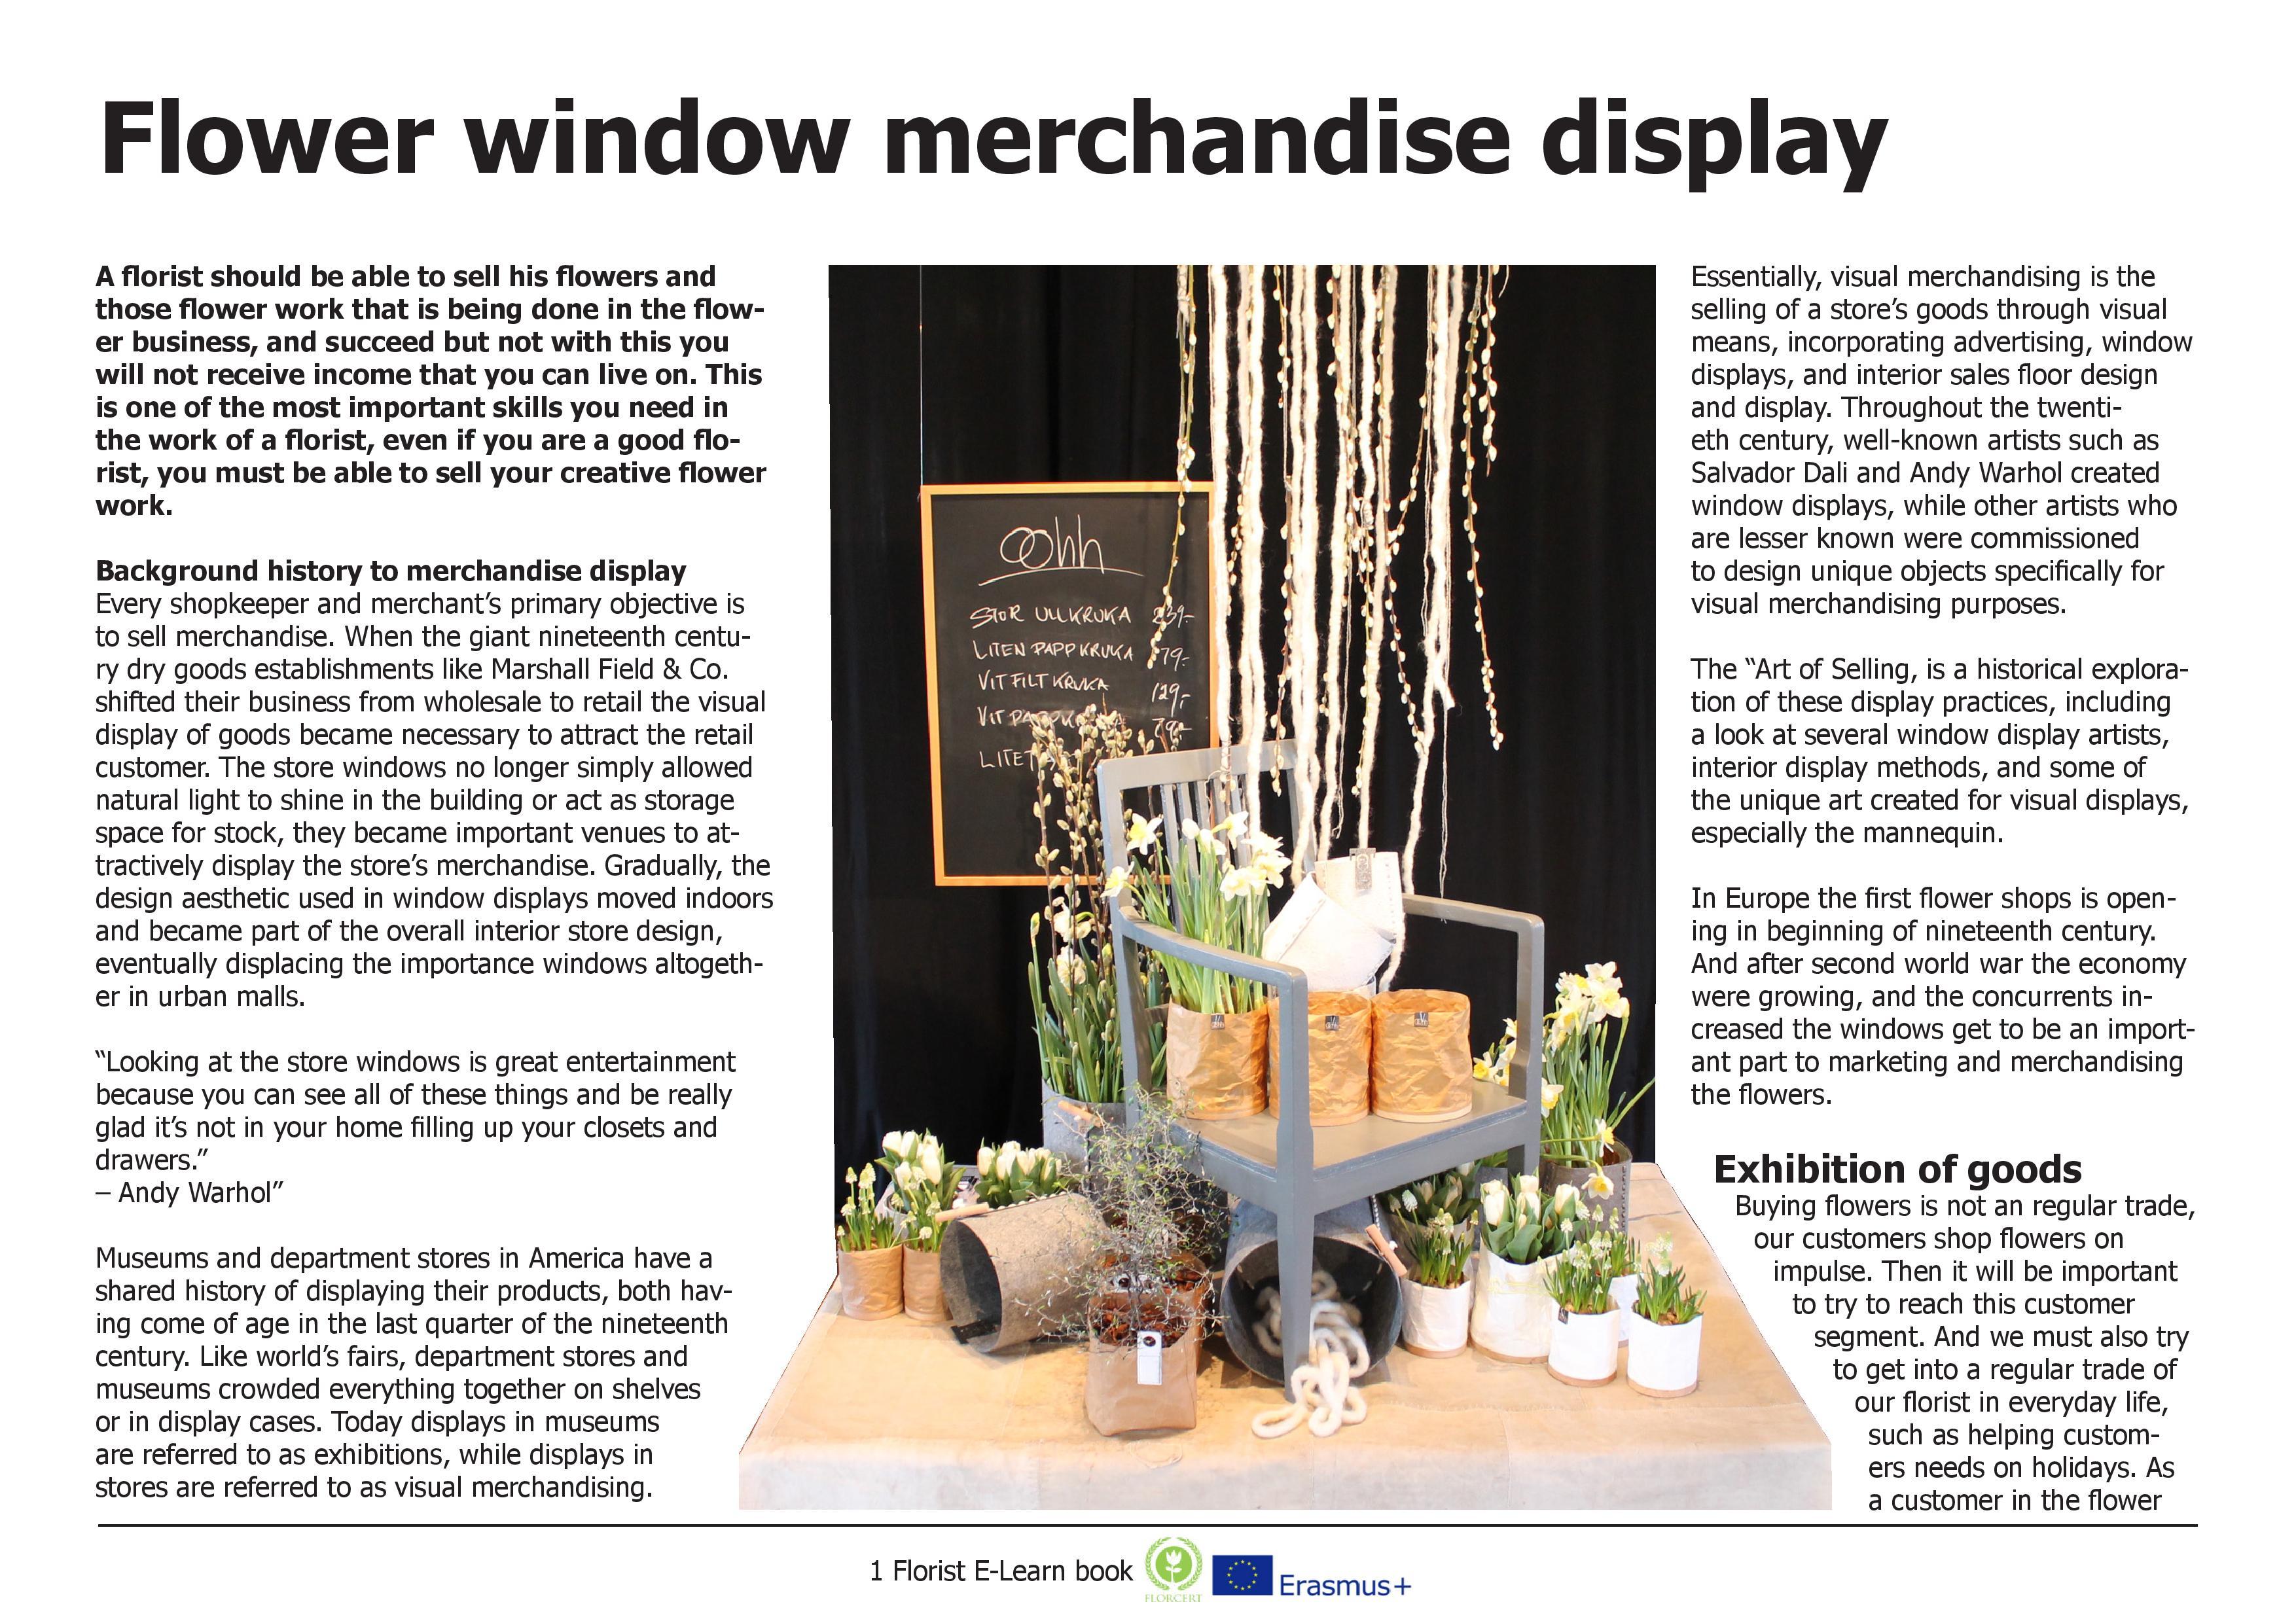 Florist E-Learn book in FlorCert